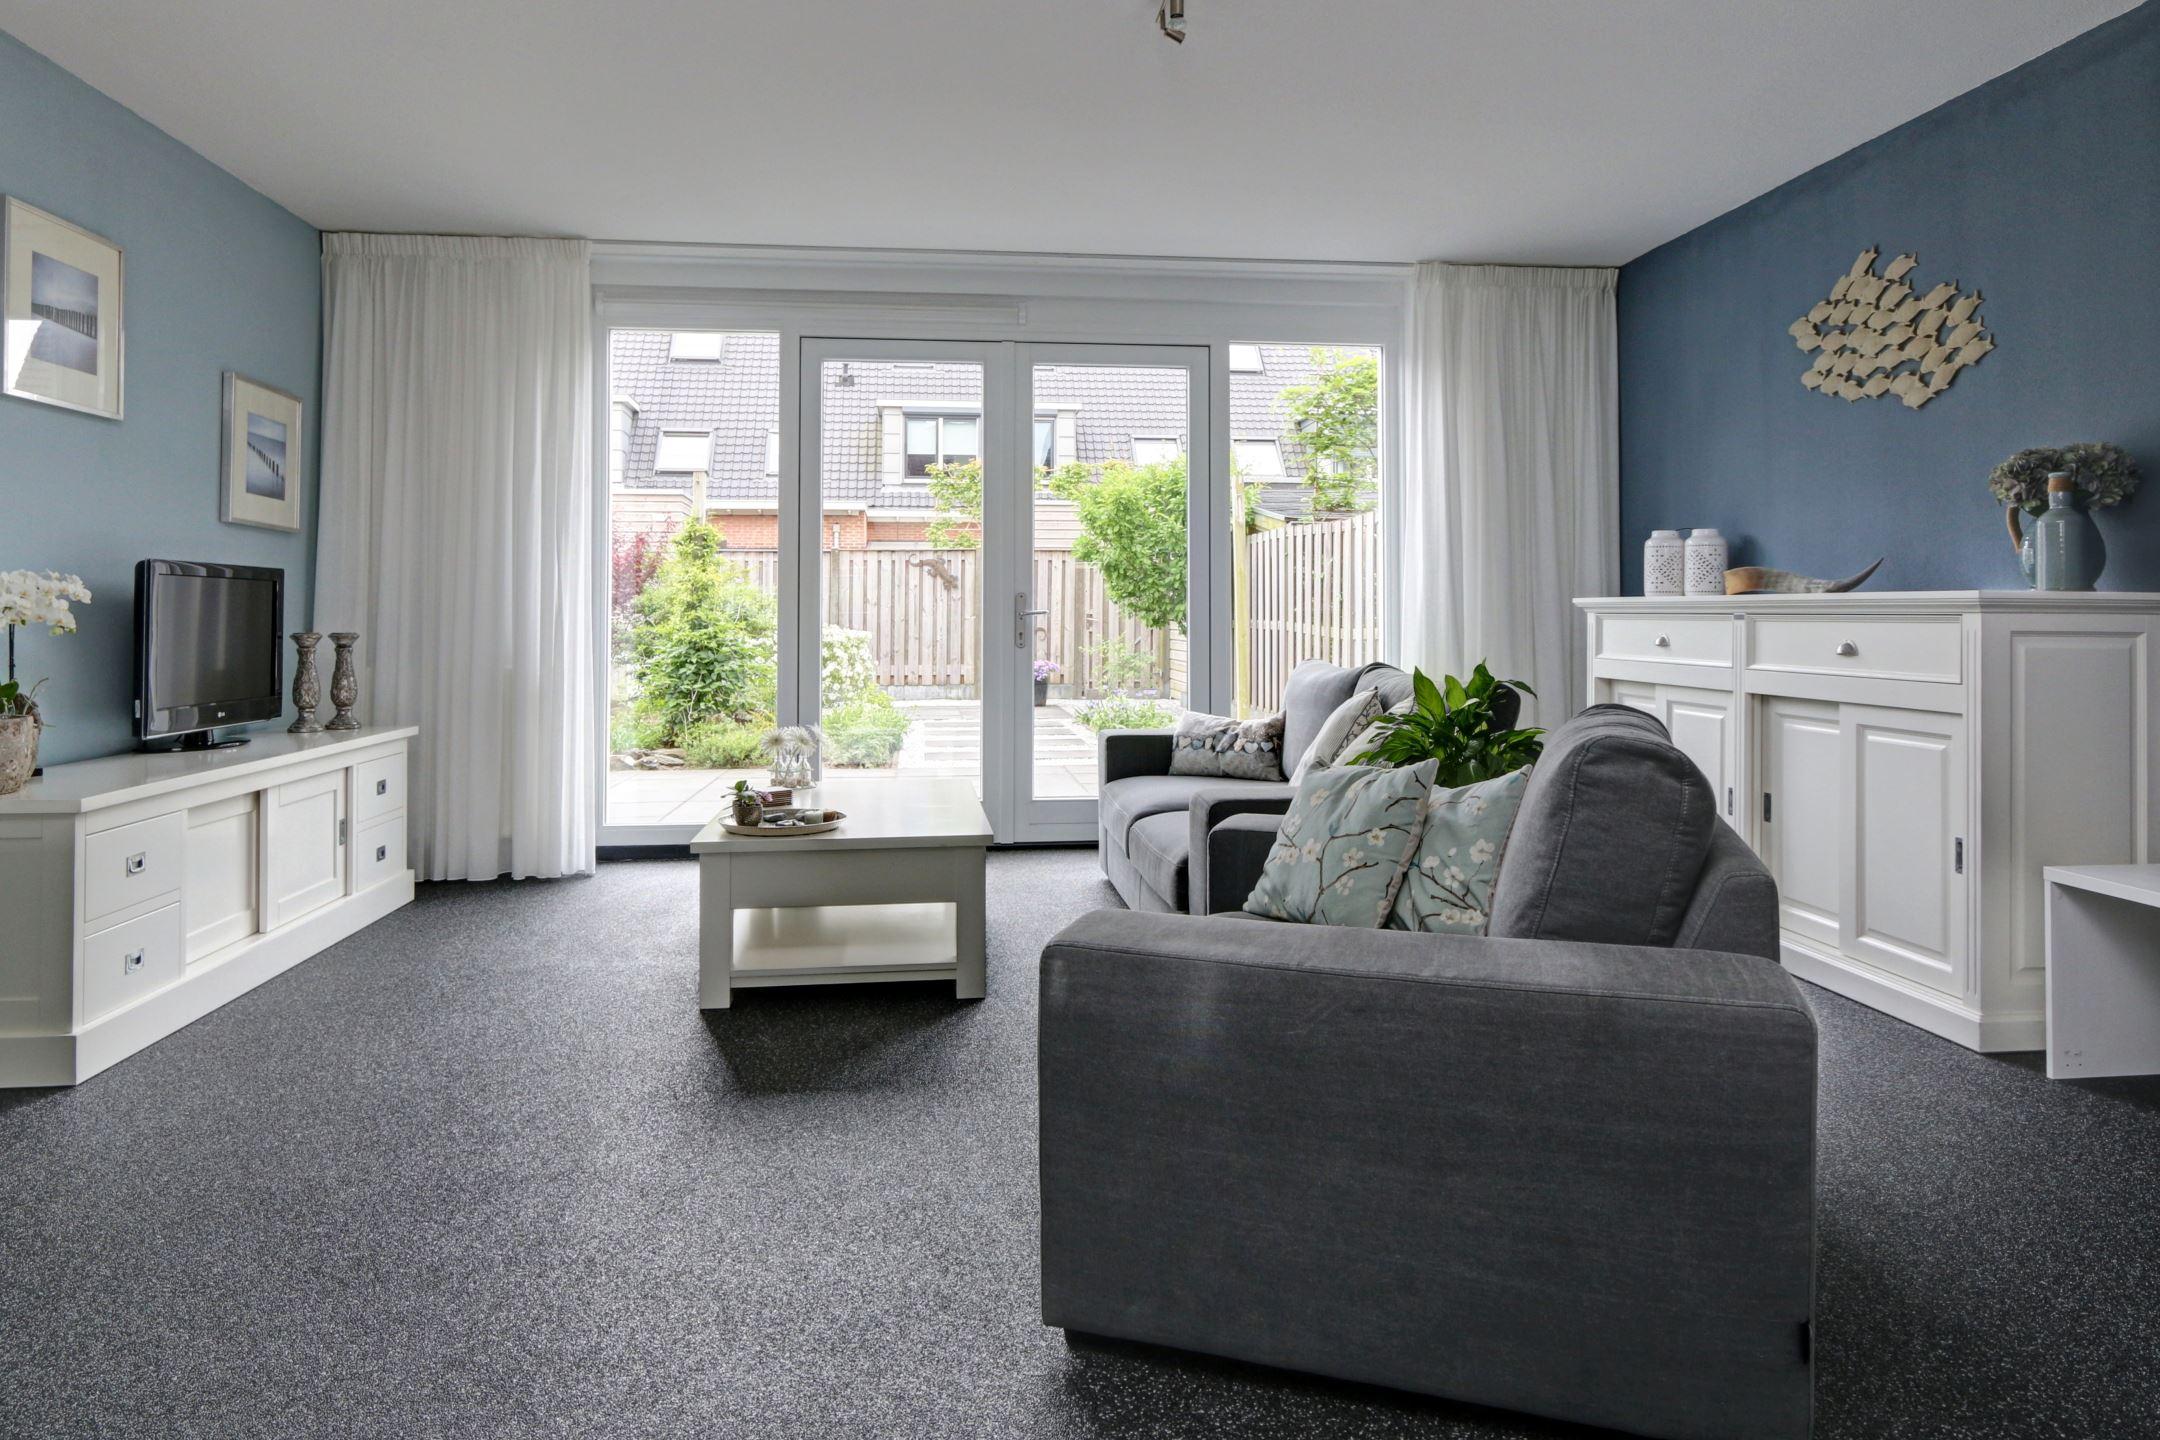 Verkocht: torenbergerhout 104 3845 hc harderwijk [funda]